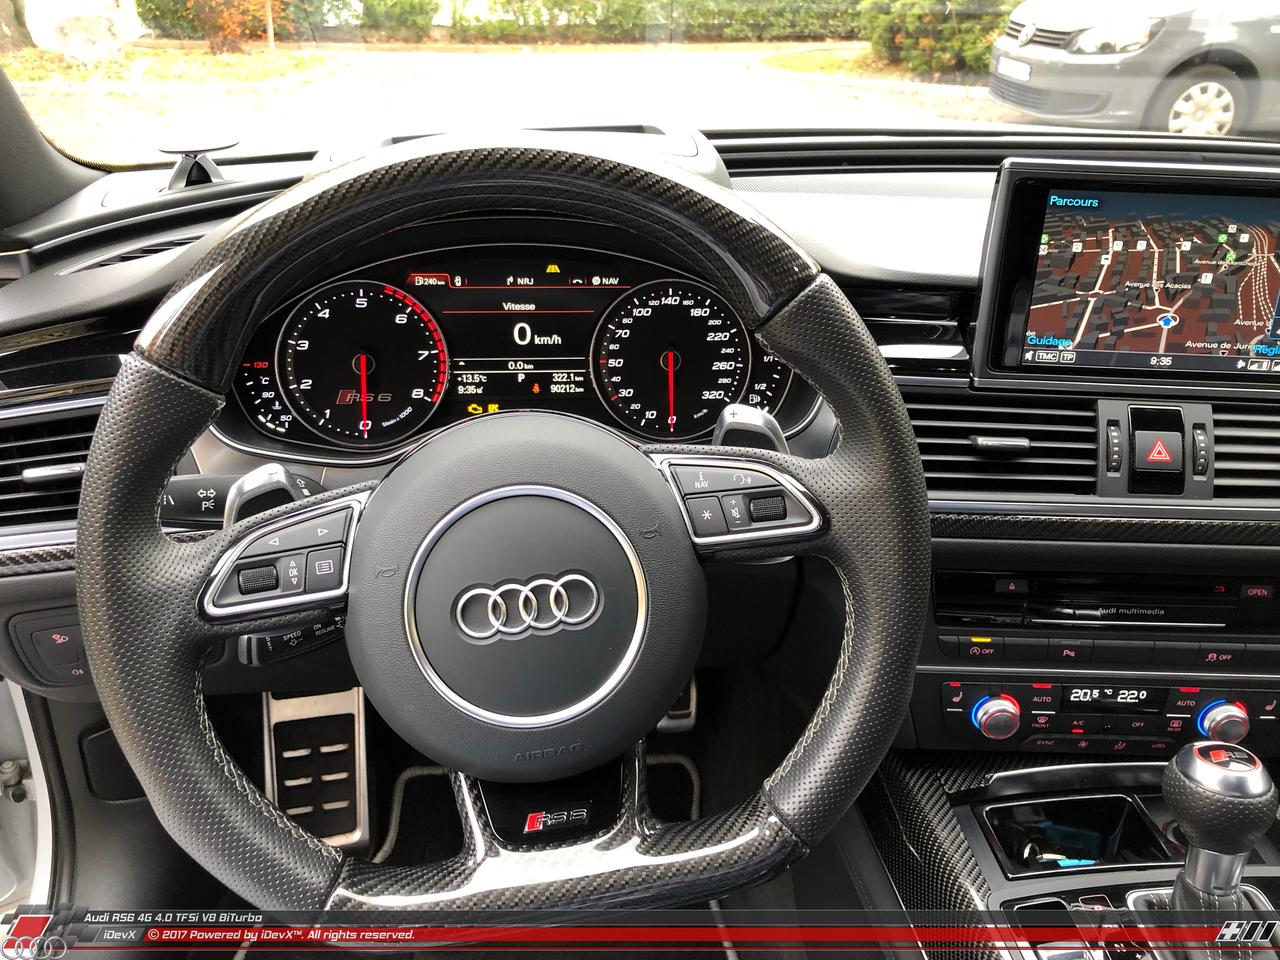 10_11.2018_Audi-RS6_iDevX_017.png